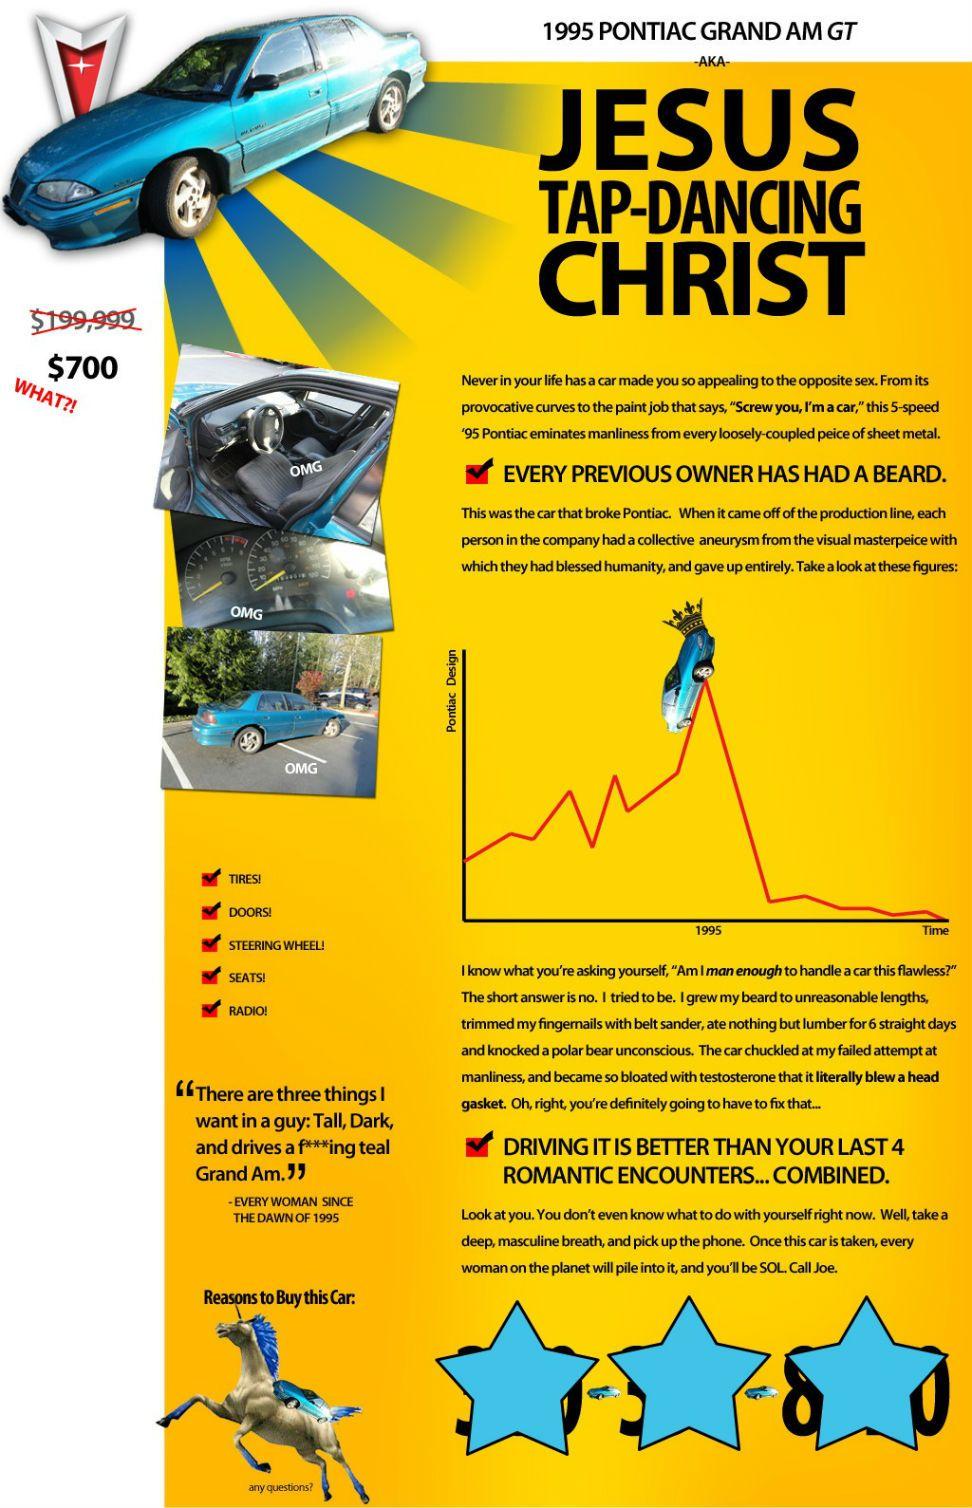 Best 25 craigslist used cars ideas on pinterest hyundai parts radiator in car and overseas education